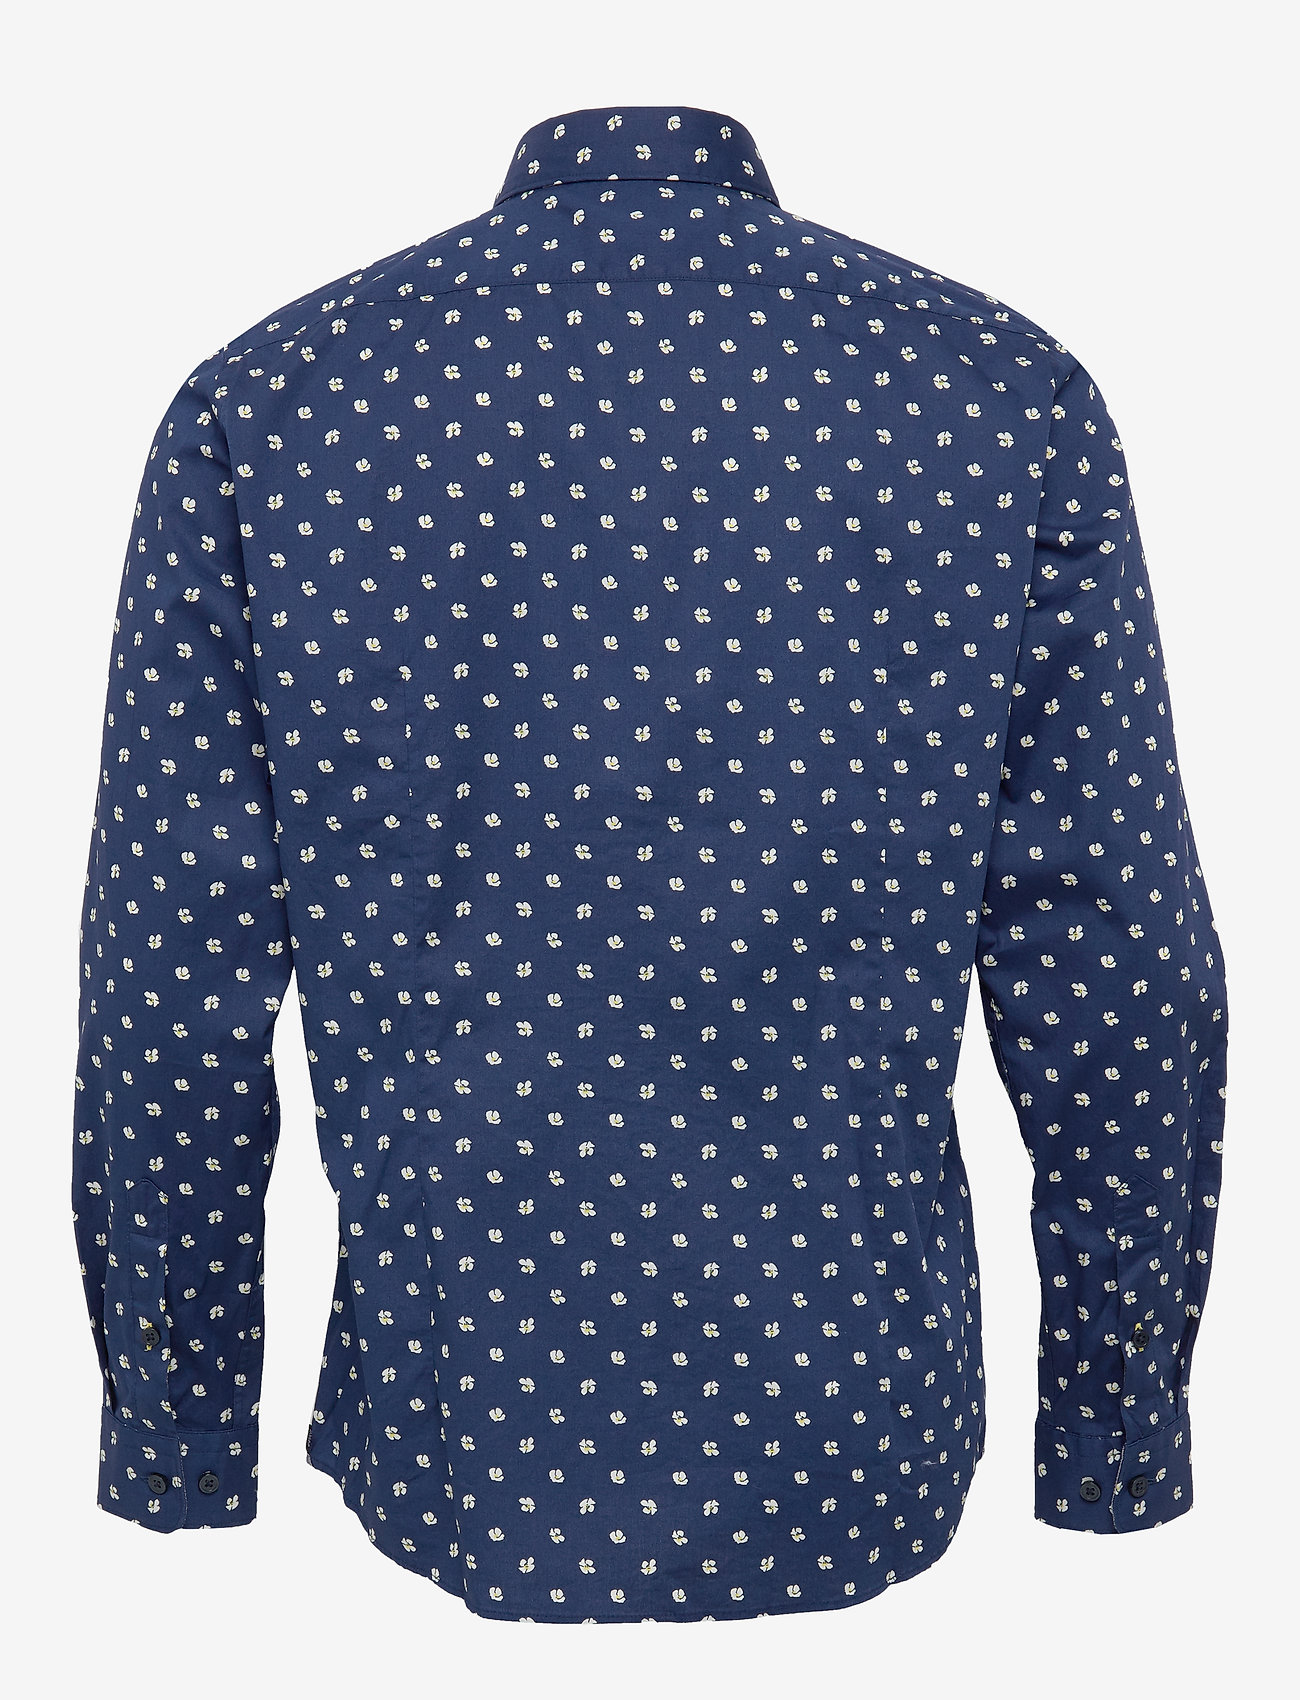 Bosslukas_53f - Hemden